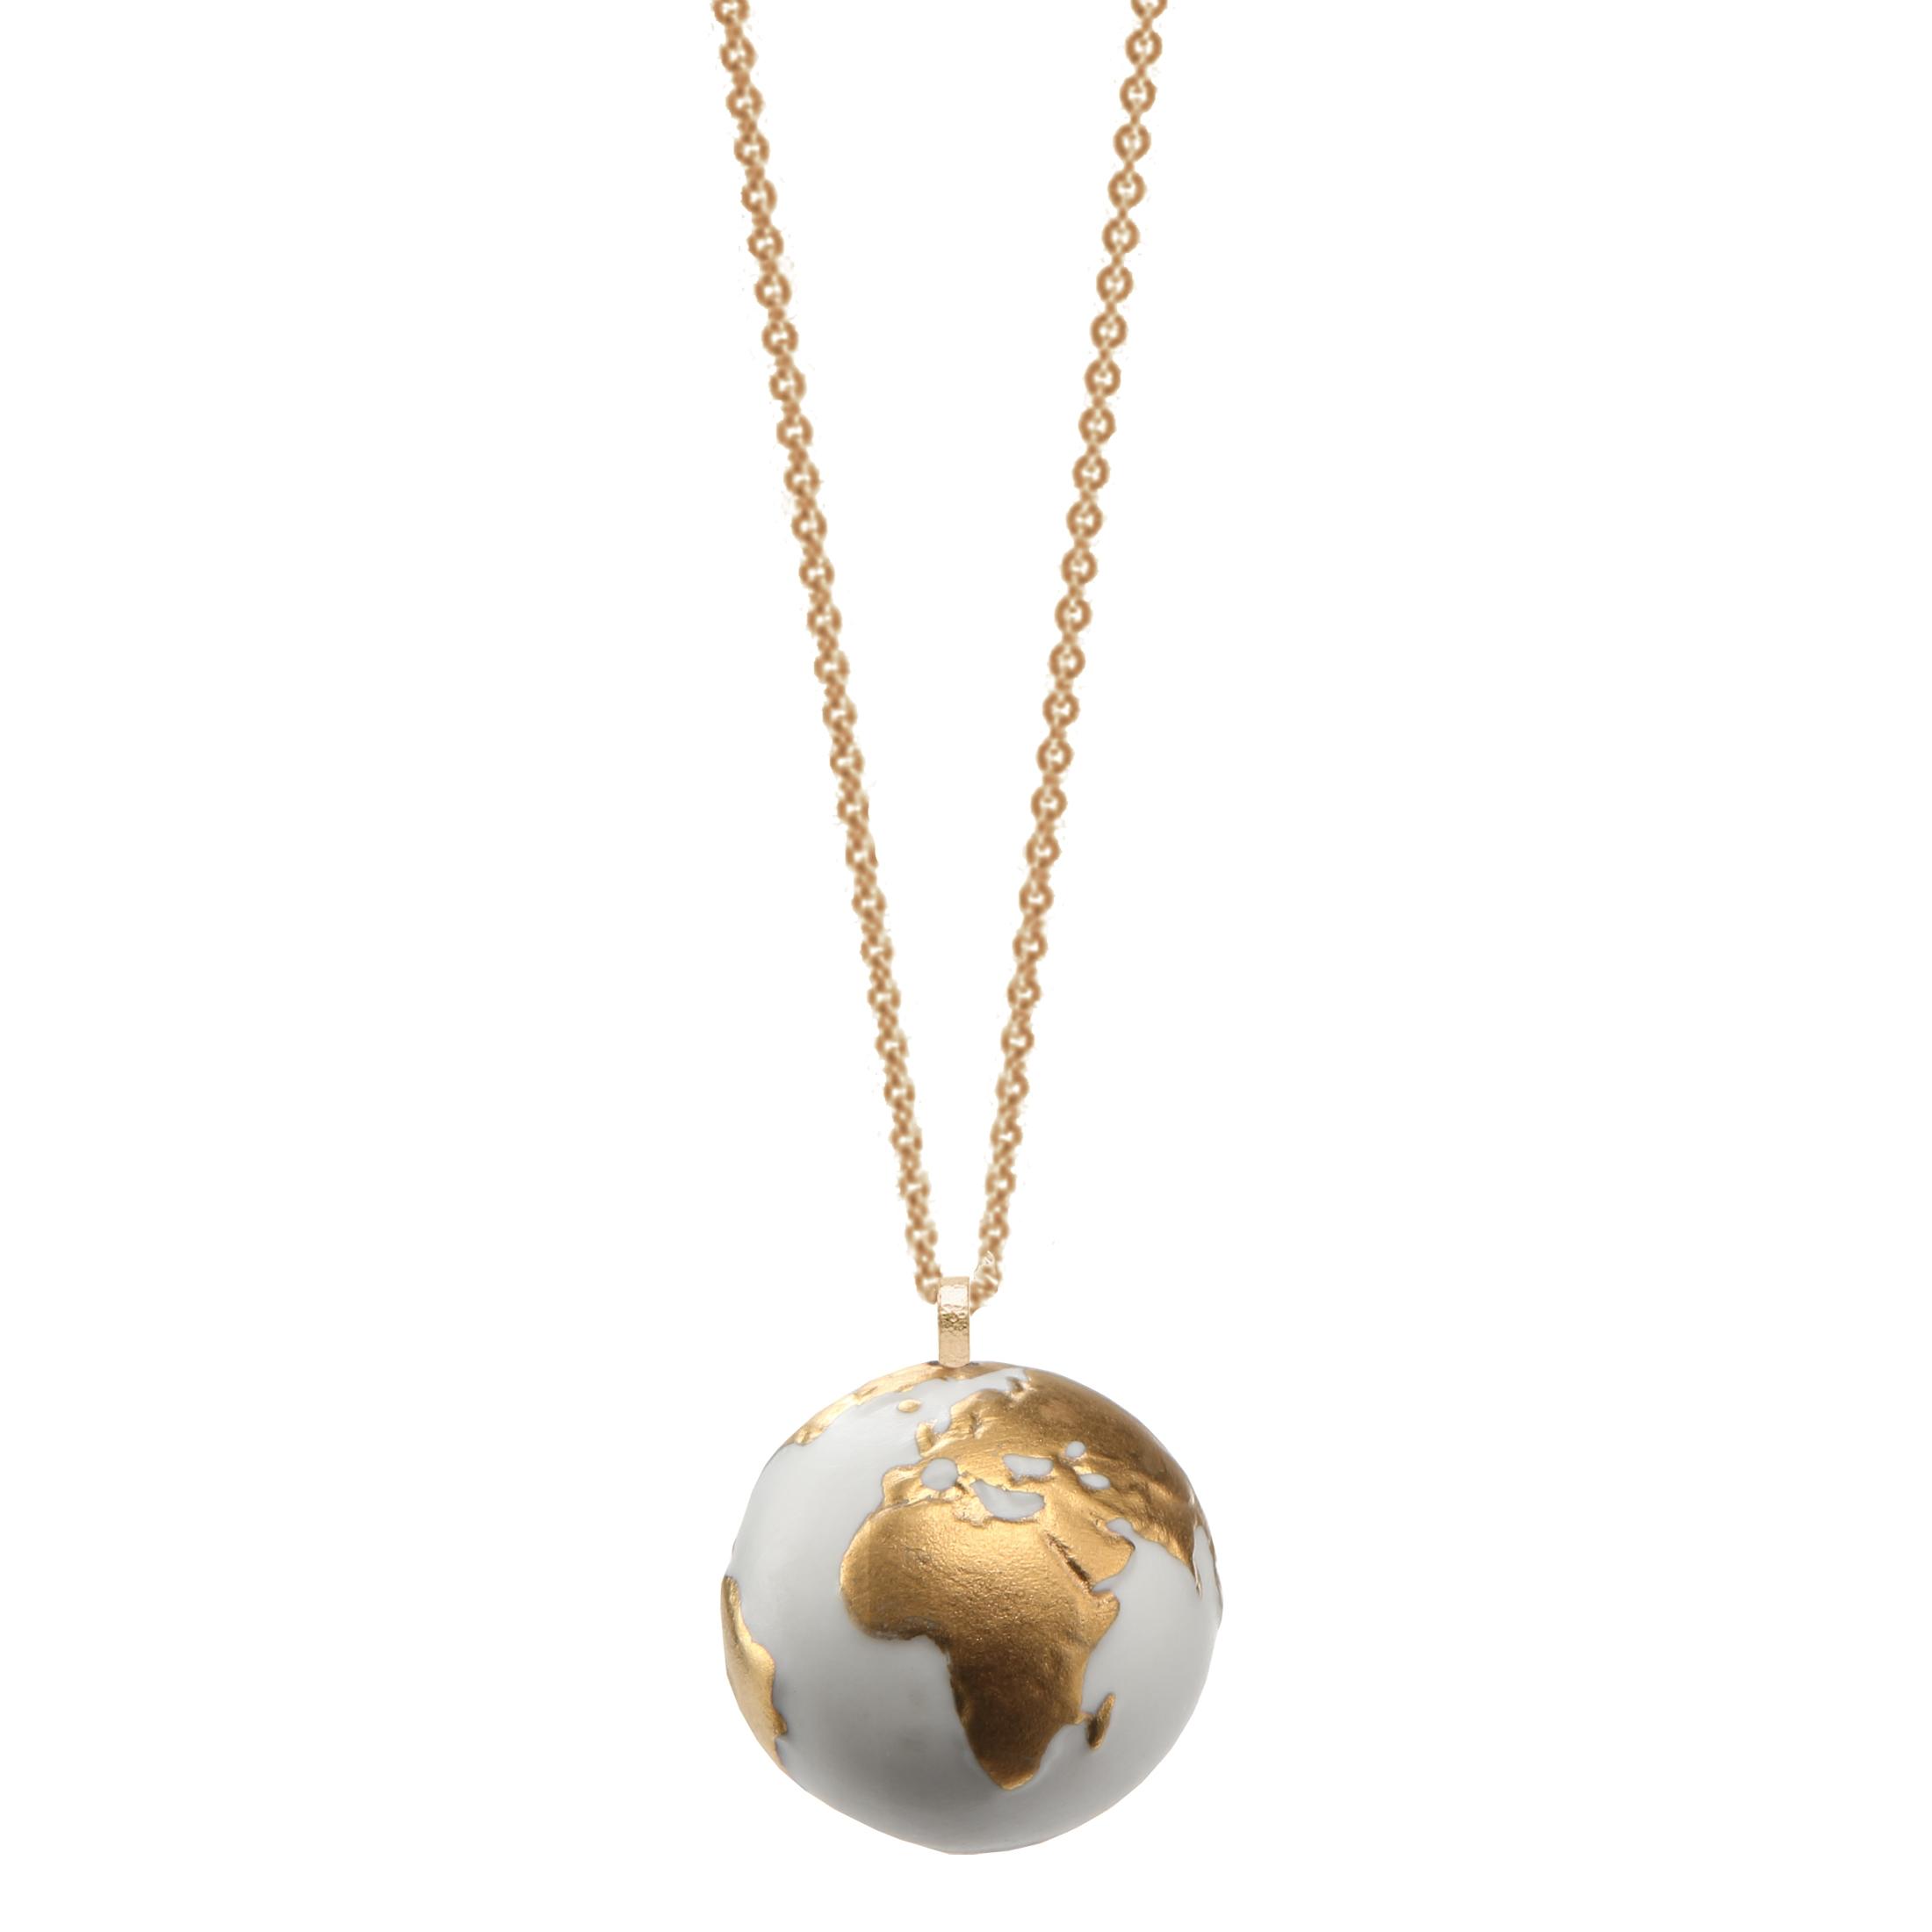 Goebel Kaiser Porzellan Globe 'KP P KE Globe Gold' 2021 !